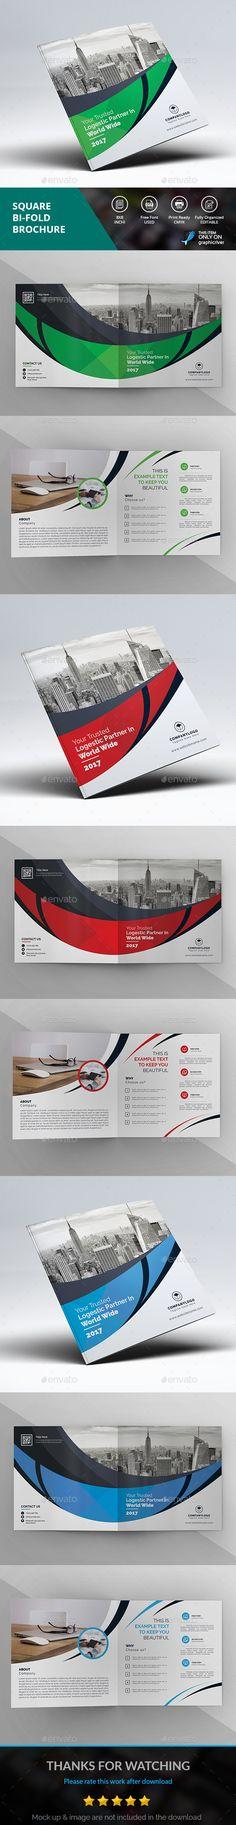 Square Bi-Fold Brochure Template PSD